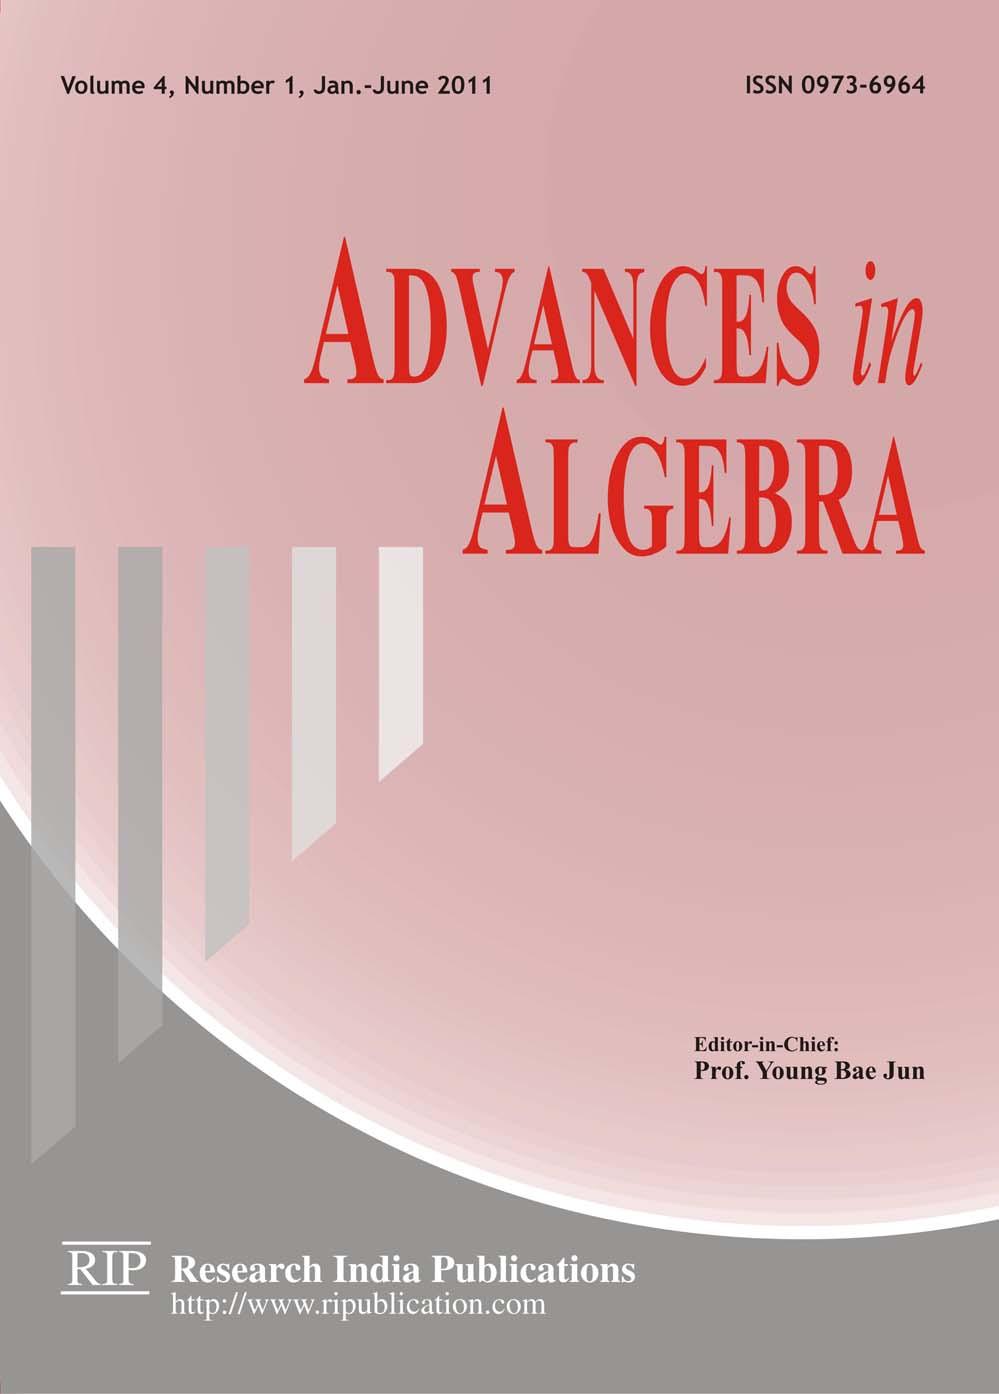 AA : Advances in Algebra, International Mathematics Journals